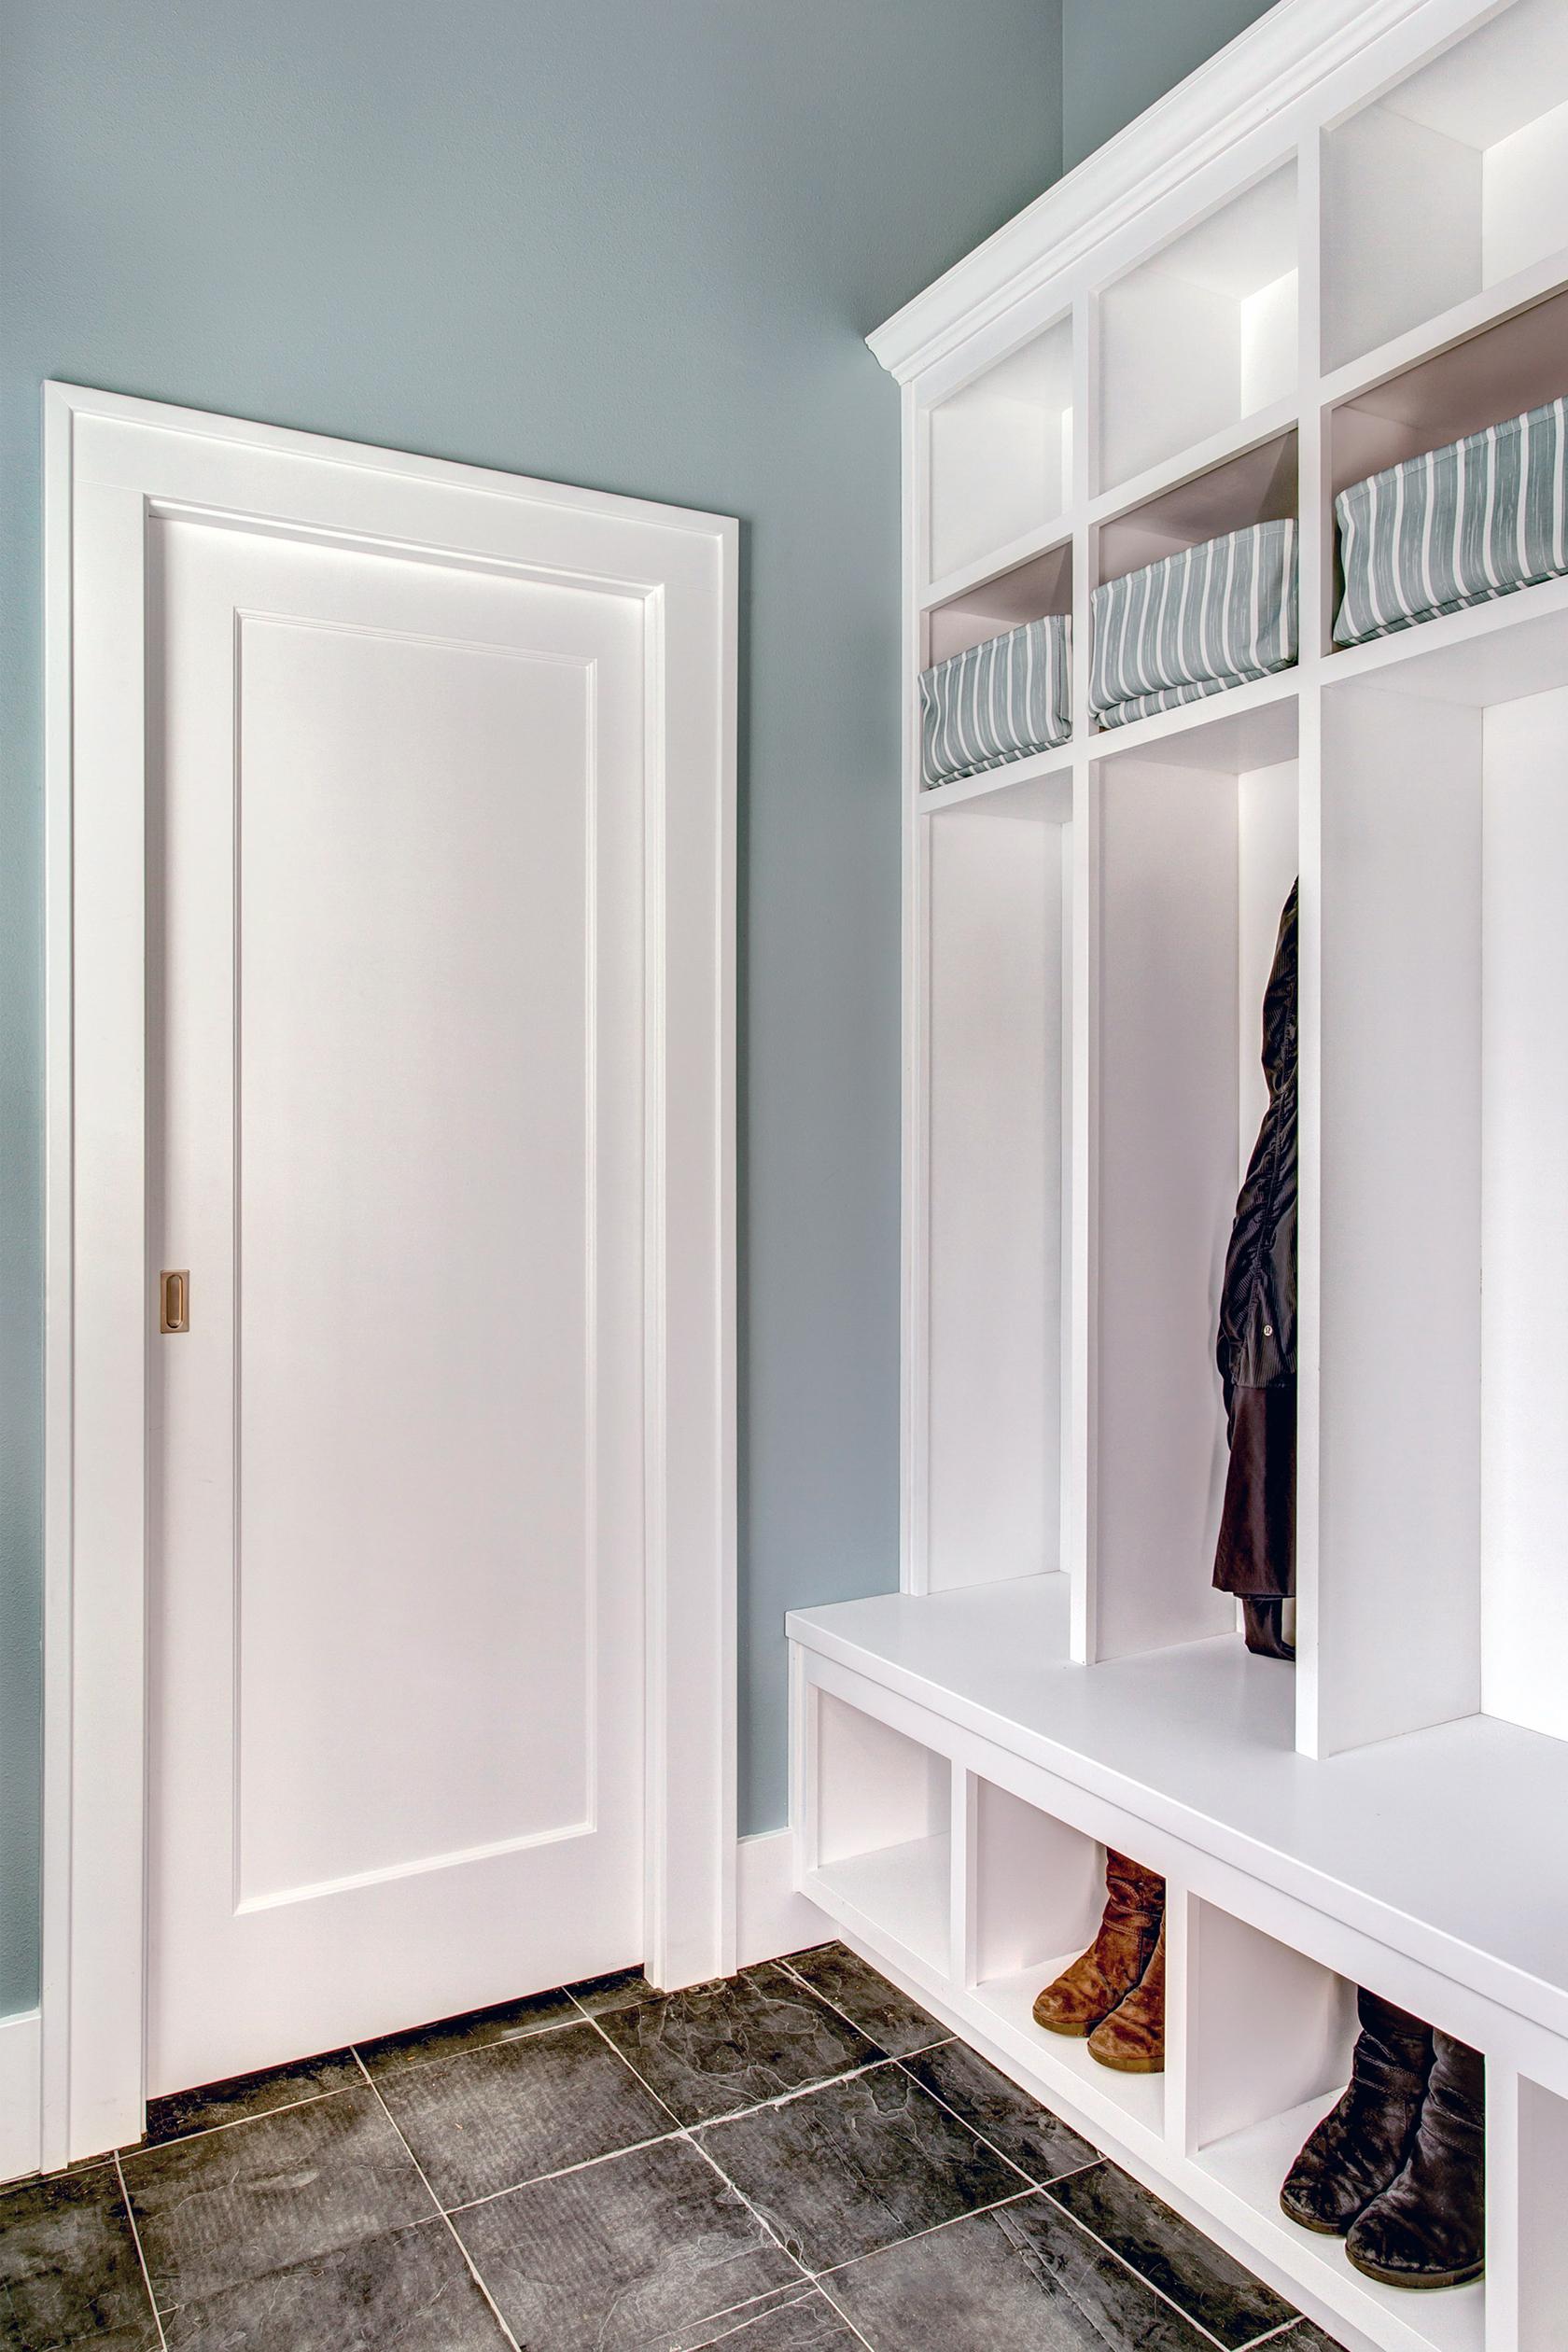 Queen Anne Craftsman – Full Refresh of a Craftsman Home – Board & Vellum